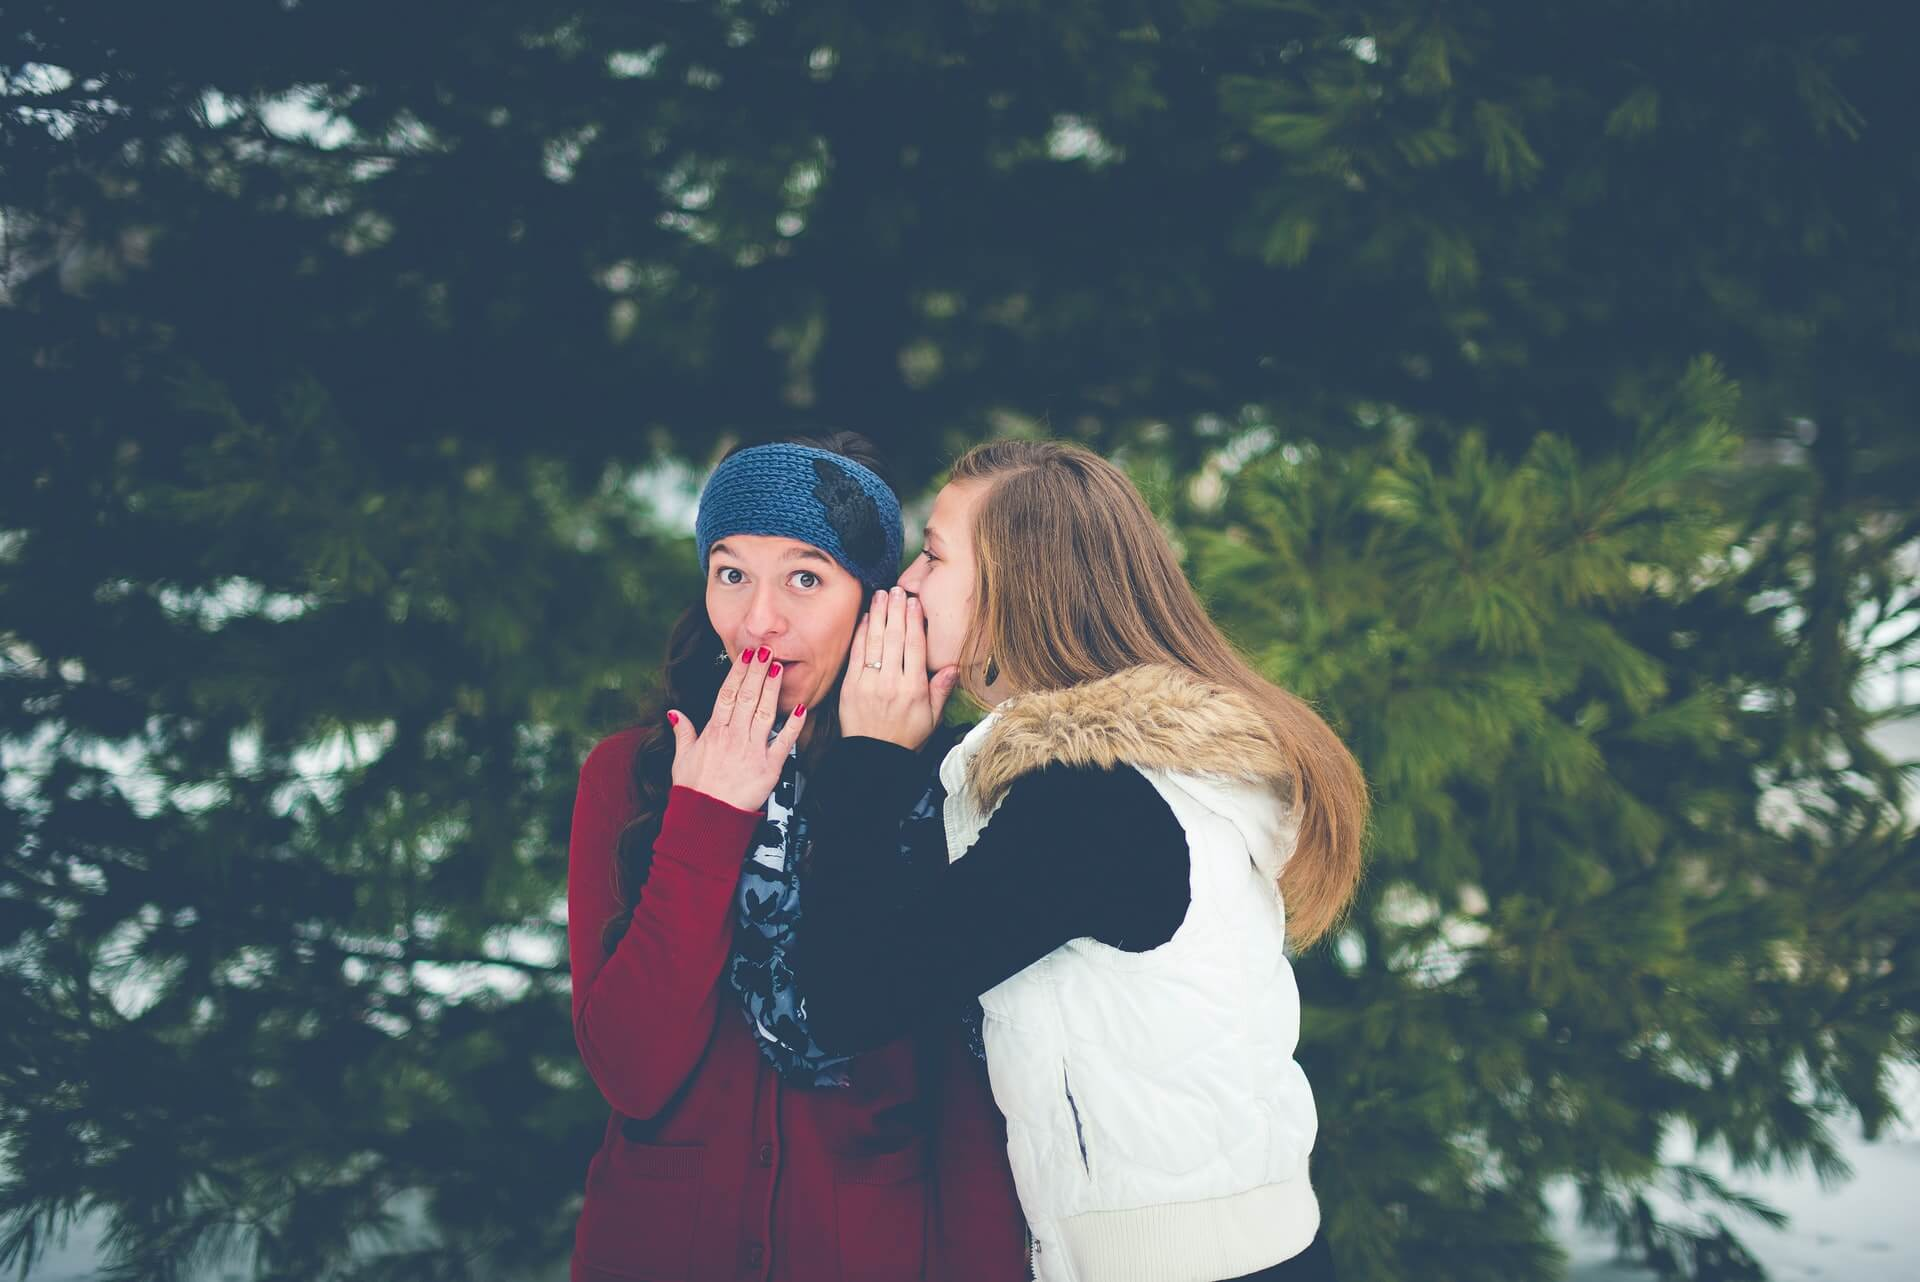 choosing-friends-to-help-plan-proposal